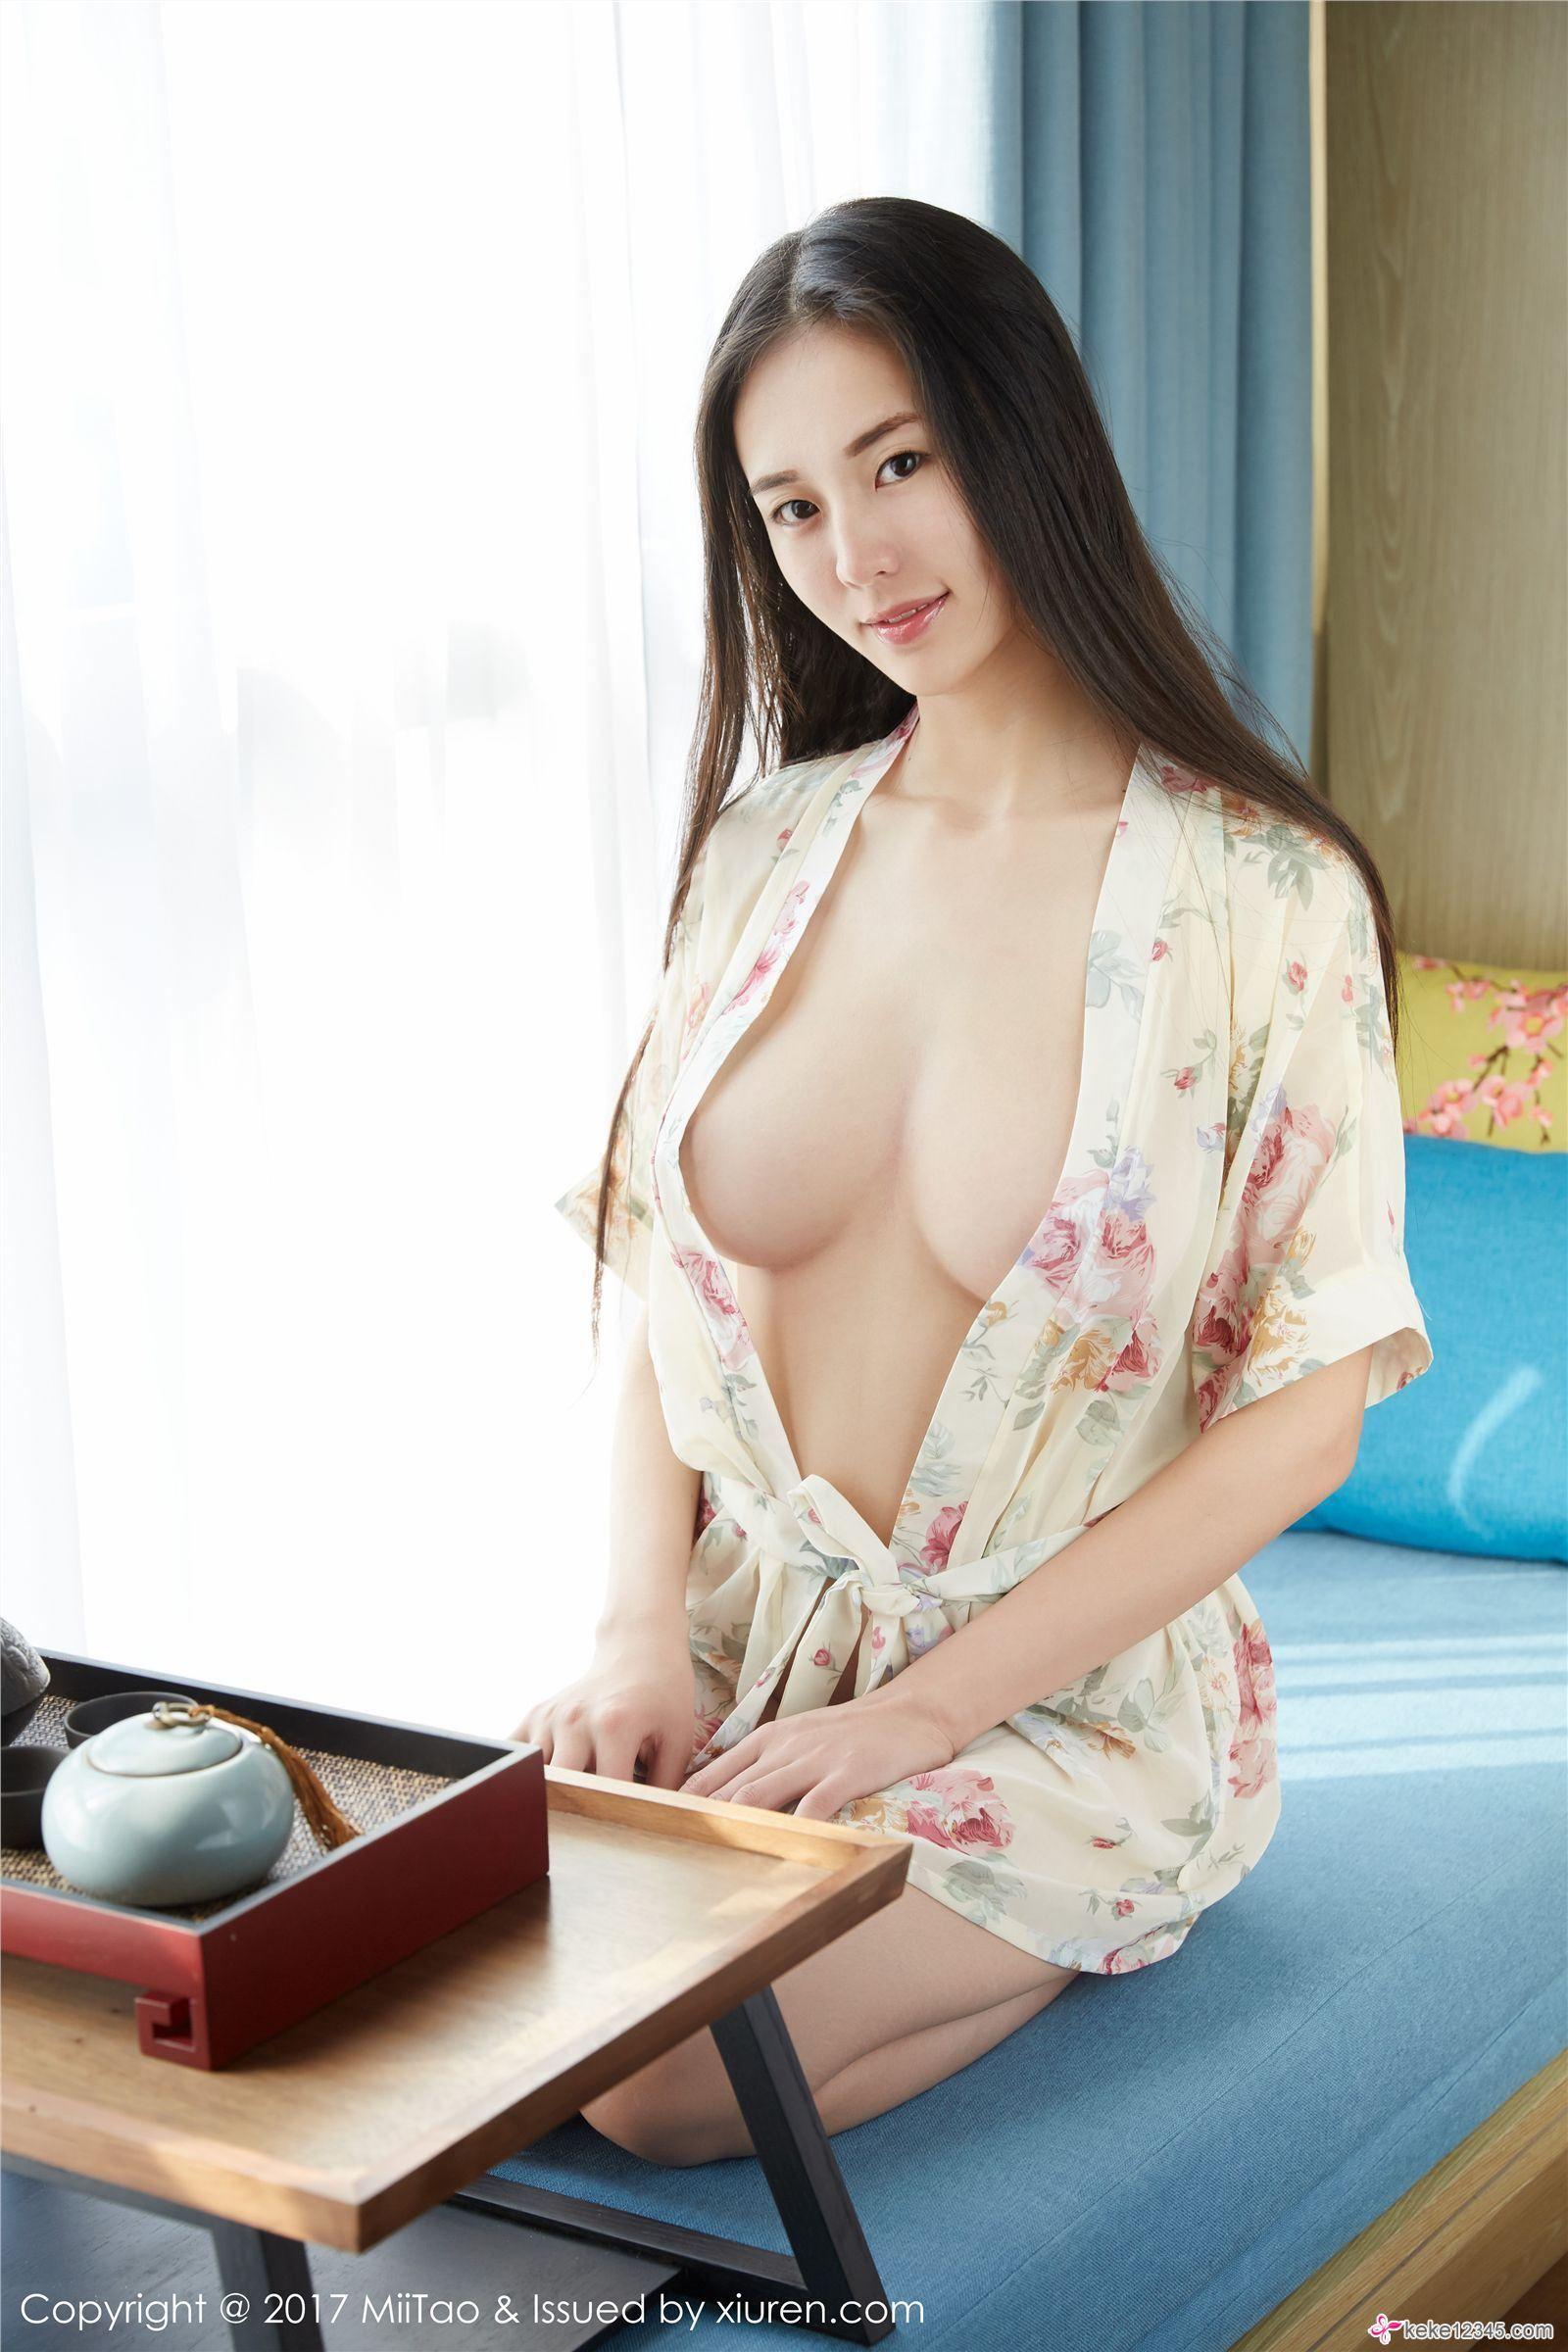 In japan movie naked